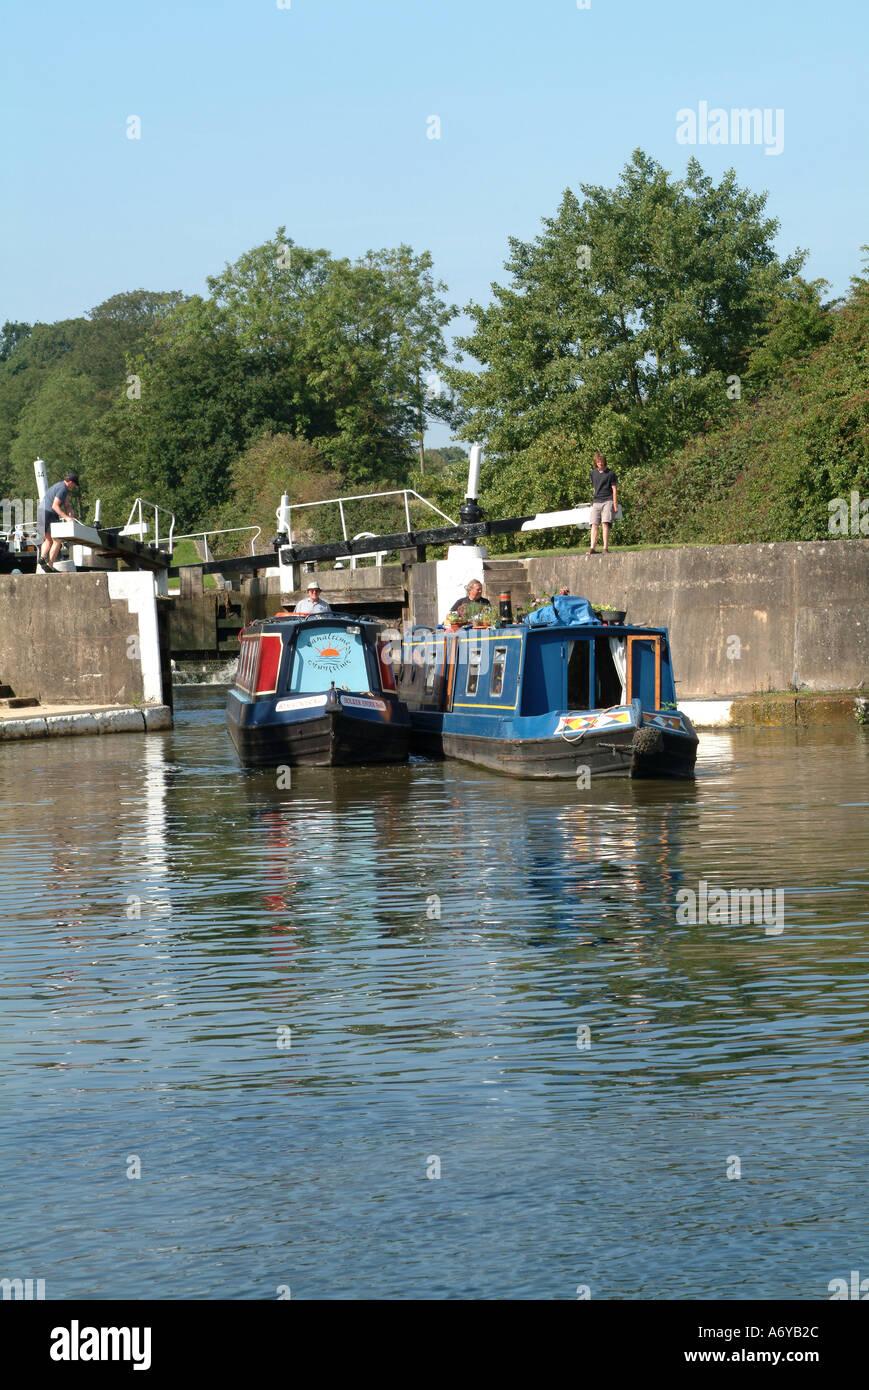 Narrow Boats Leaving Lock at Hatton Grand Union Canal Warwickshire England United Kingdom UK - Stock Image